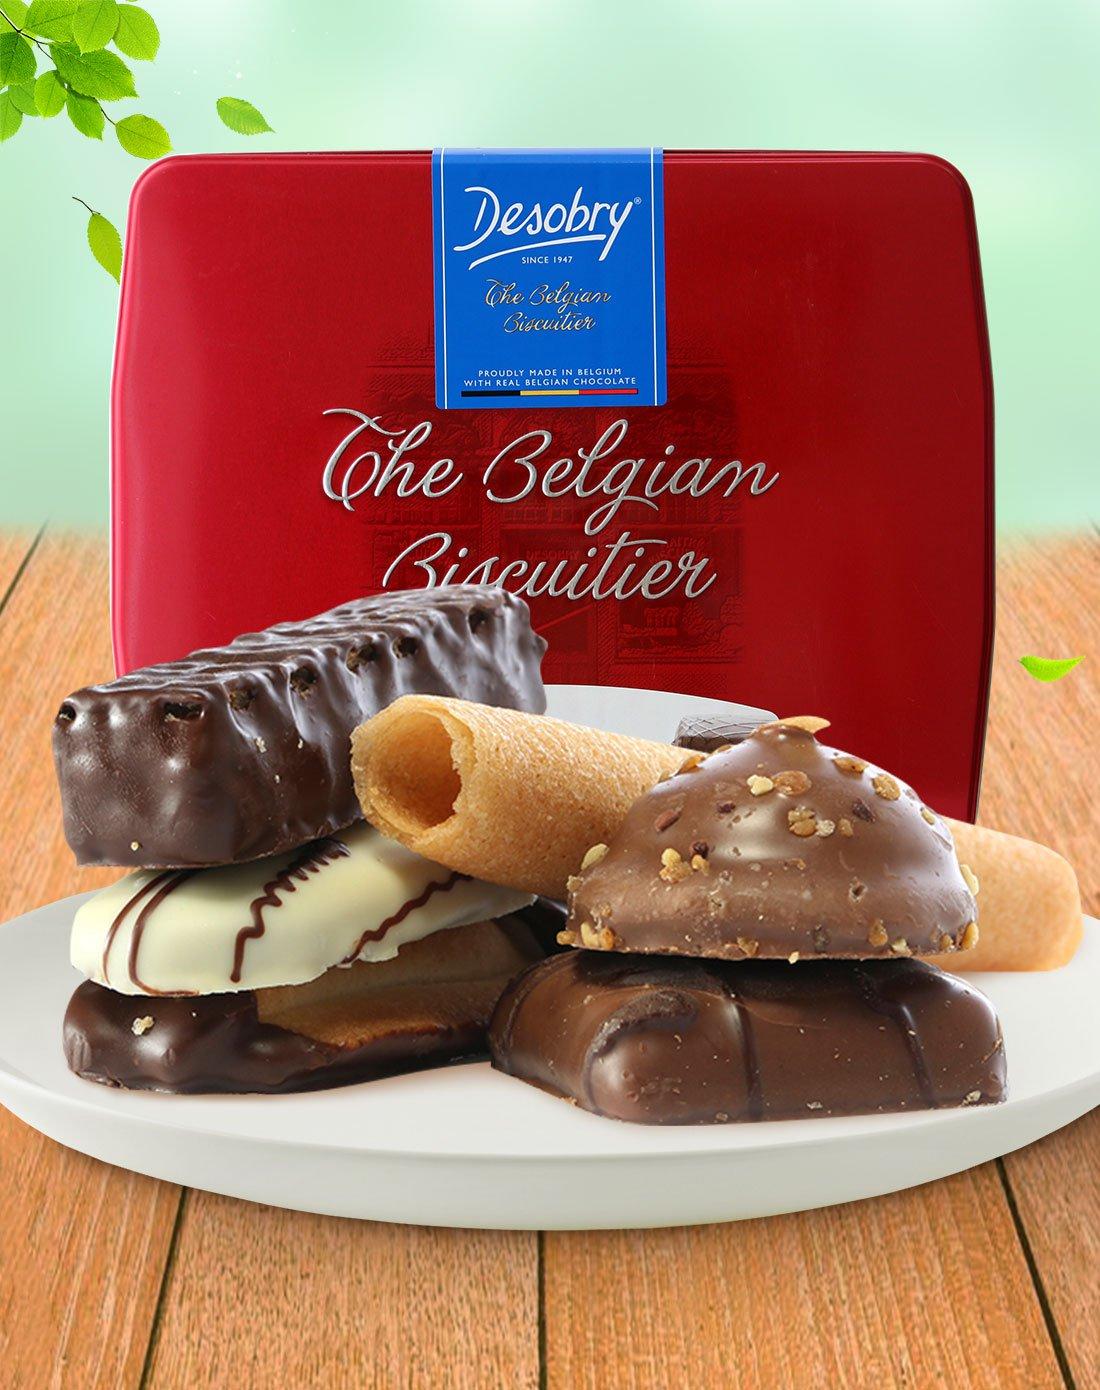 Bánh Desobry 1kg Bỉ